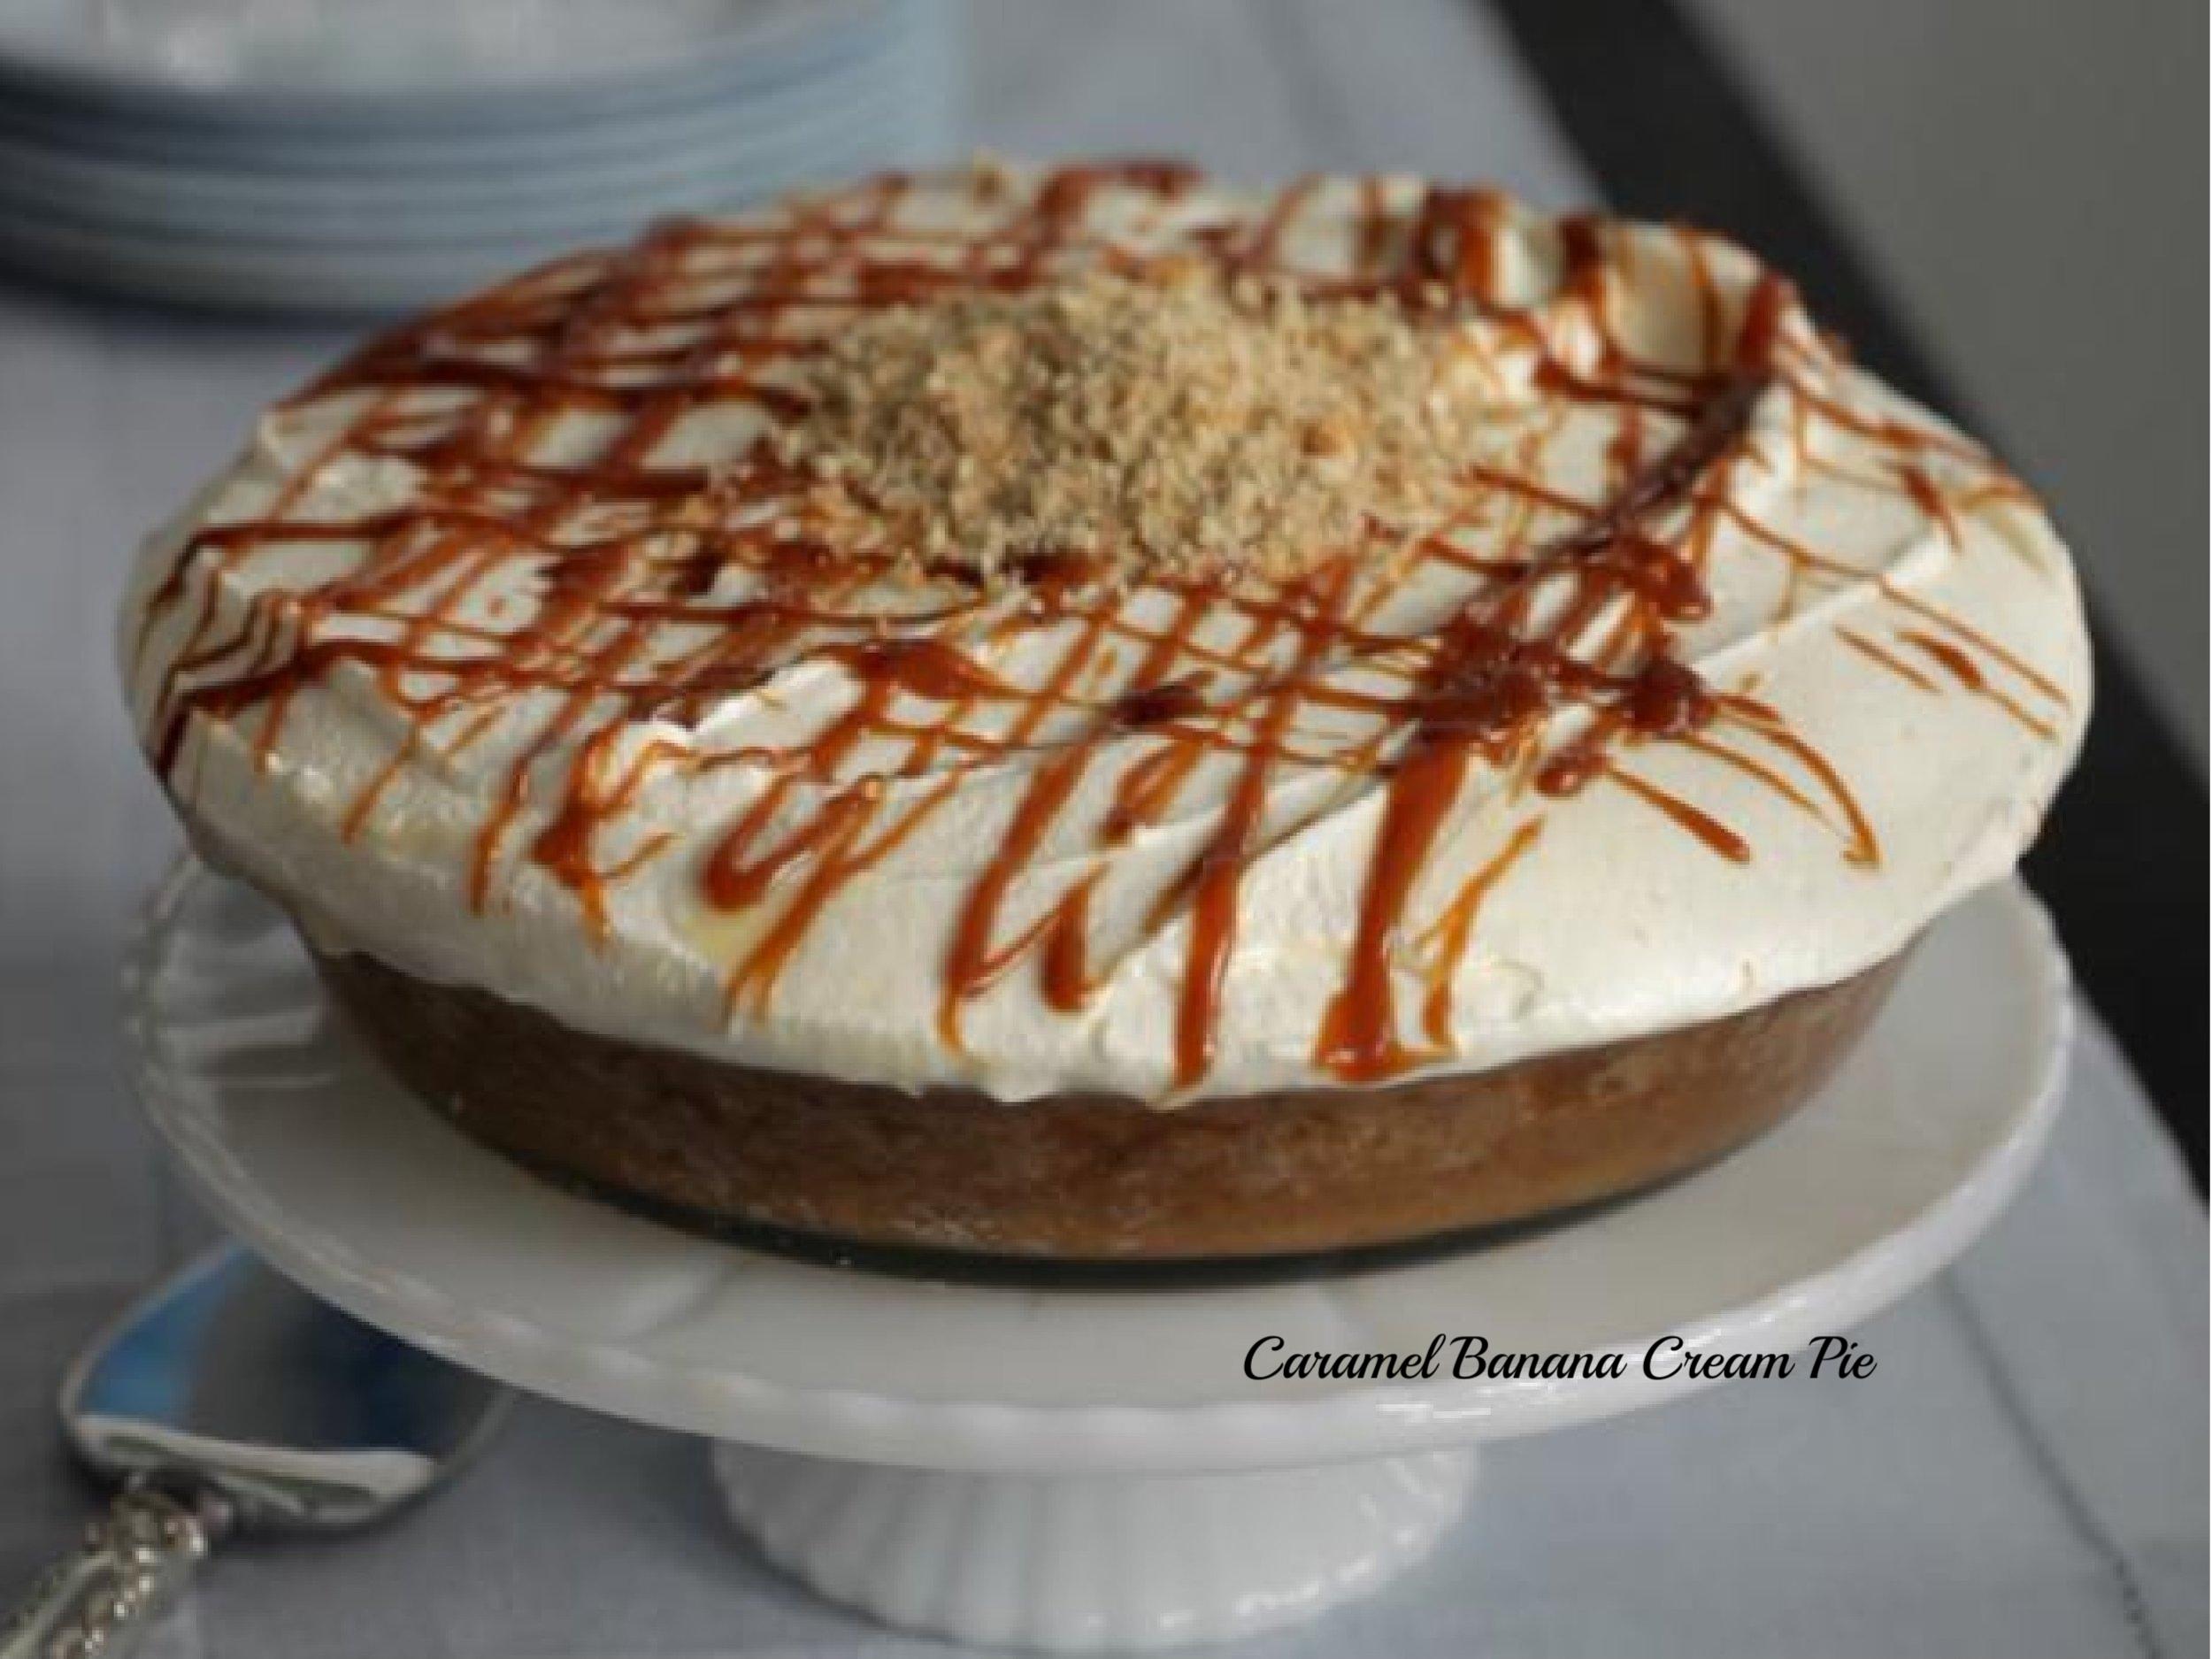 Caramel Banana Cream Pie.jpeg